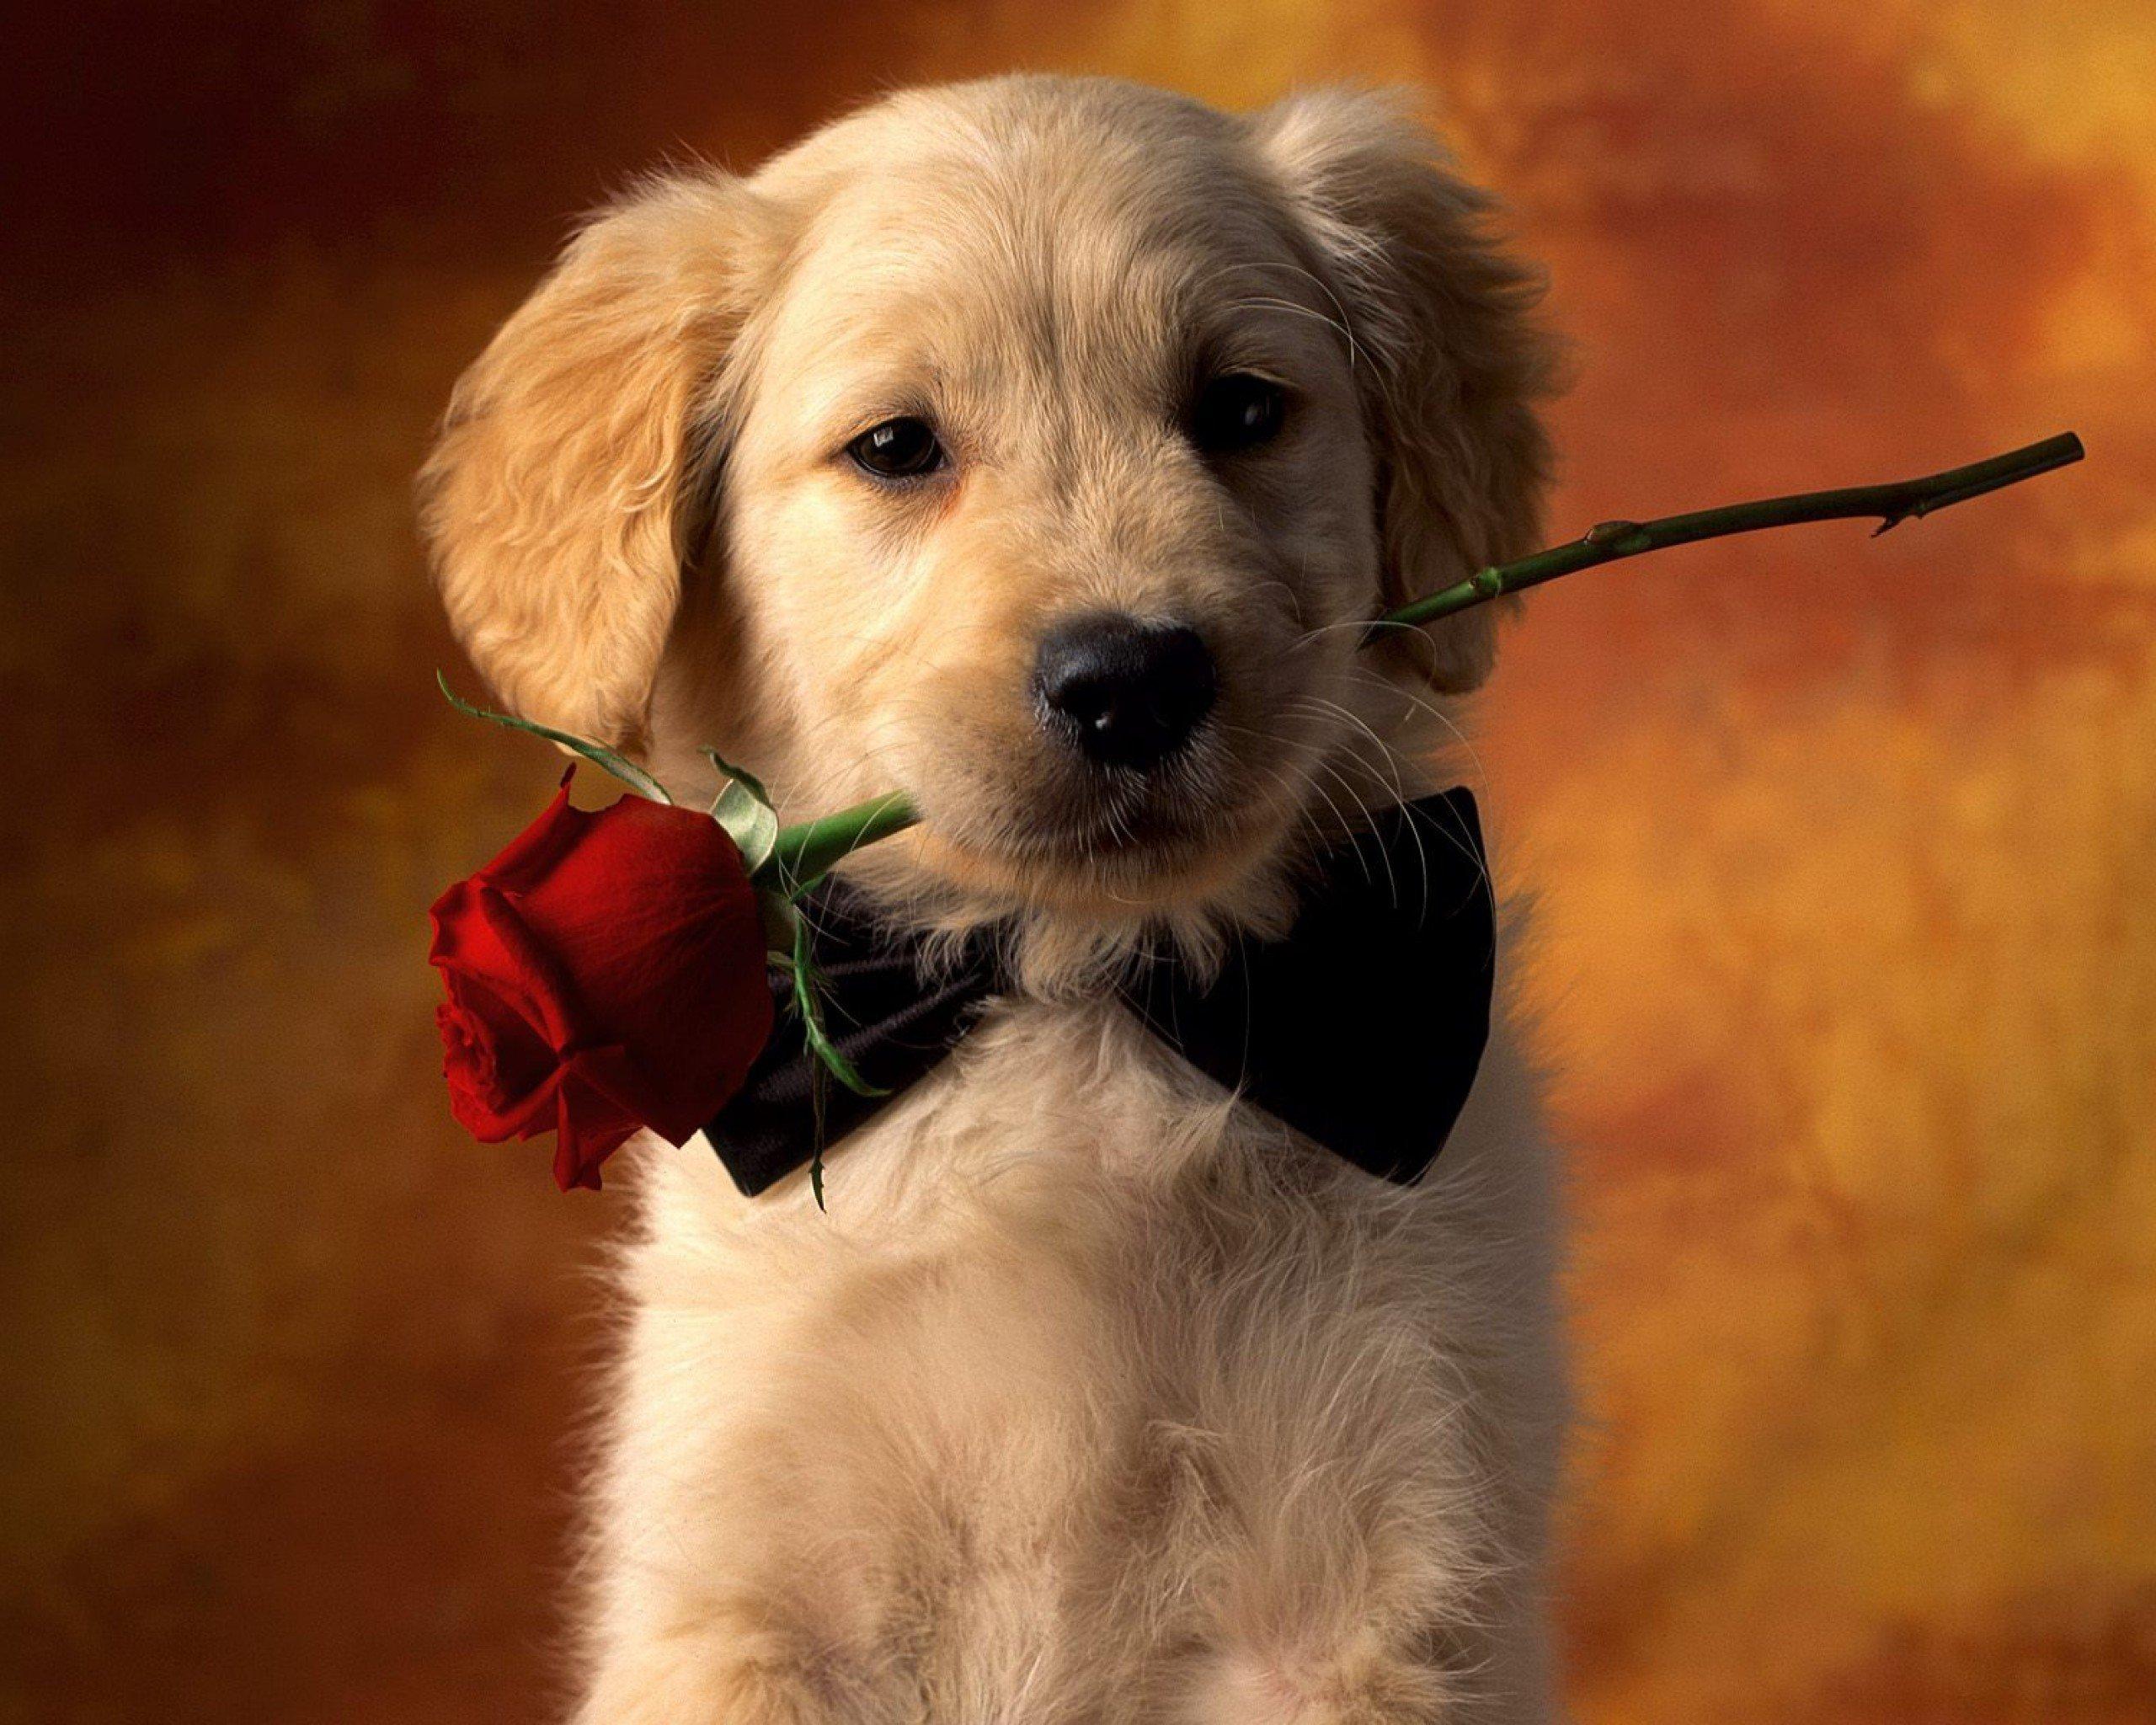 50 Cute Dogs Wallpapers Dog Puppy Desktop Wallpapers 2560x2048